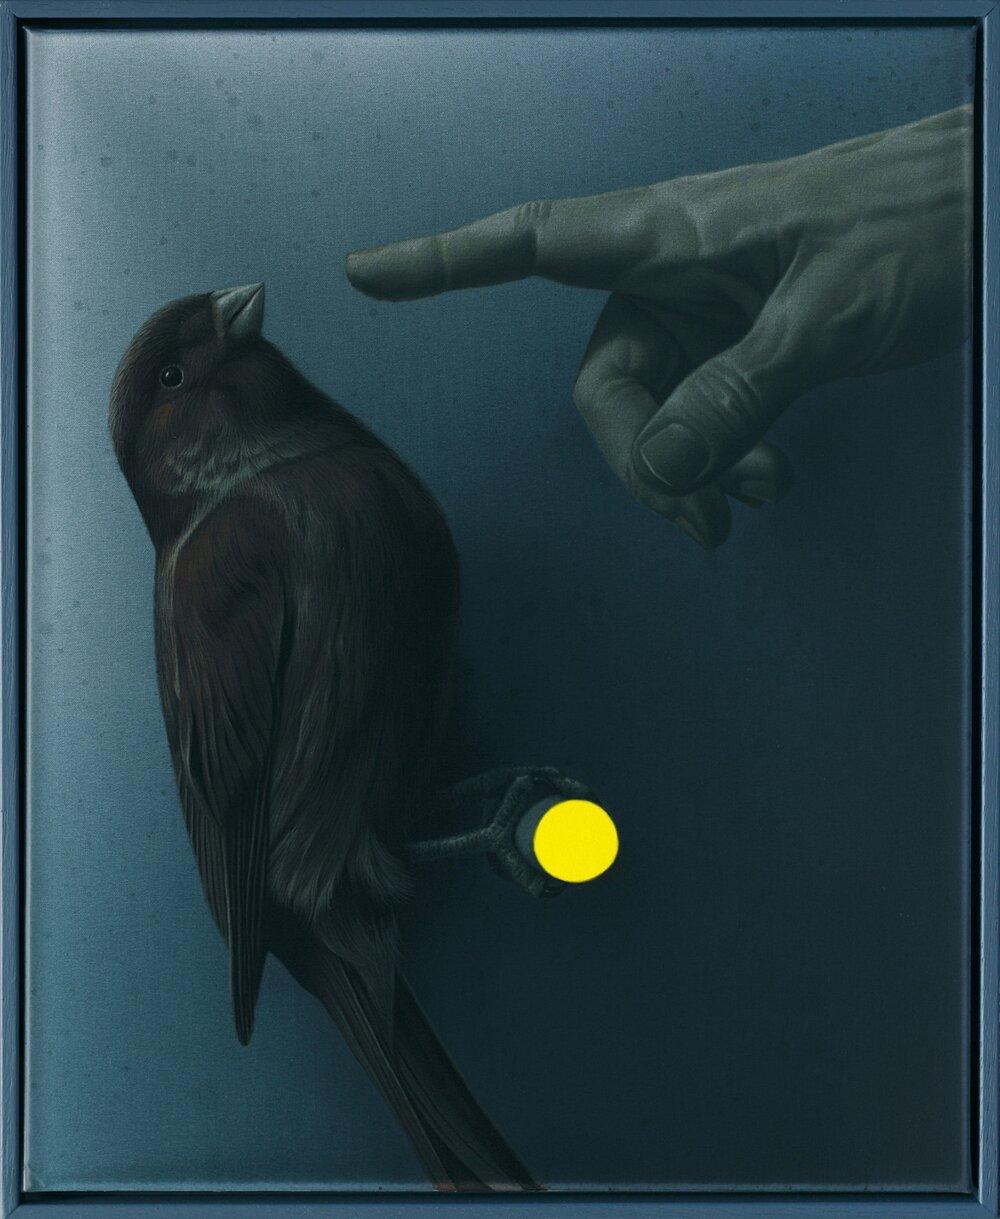 dipinti-eckart-hahn-14-keb